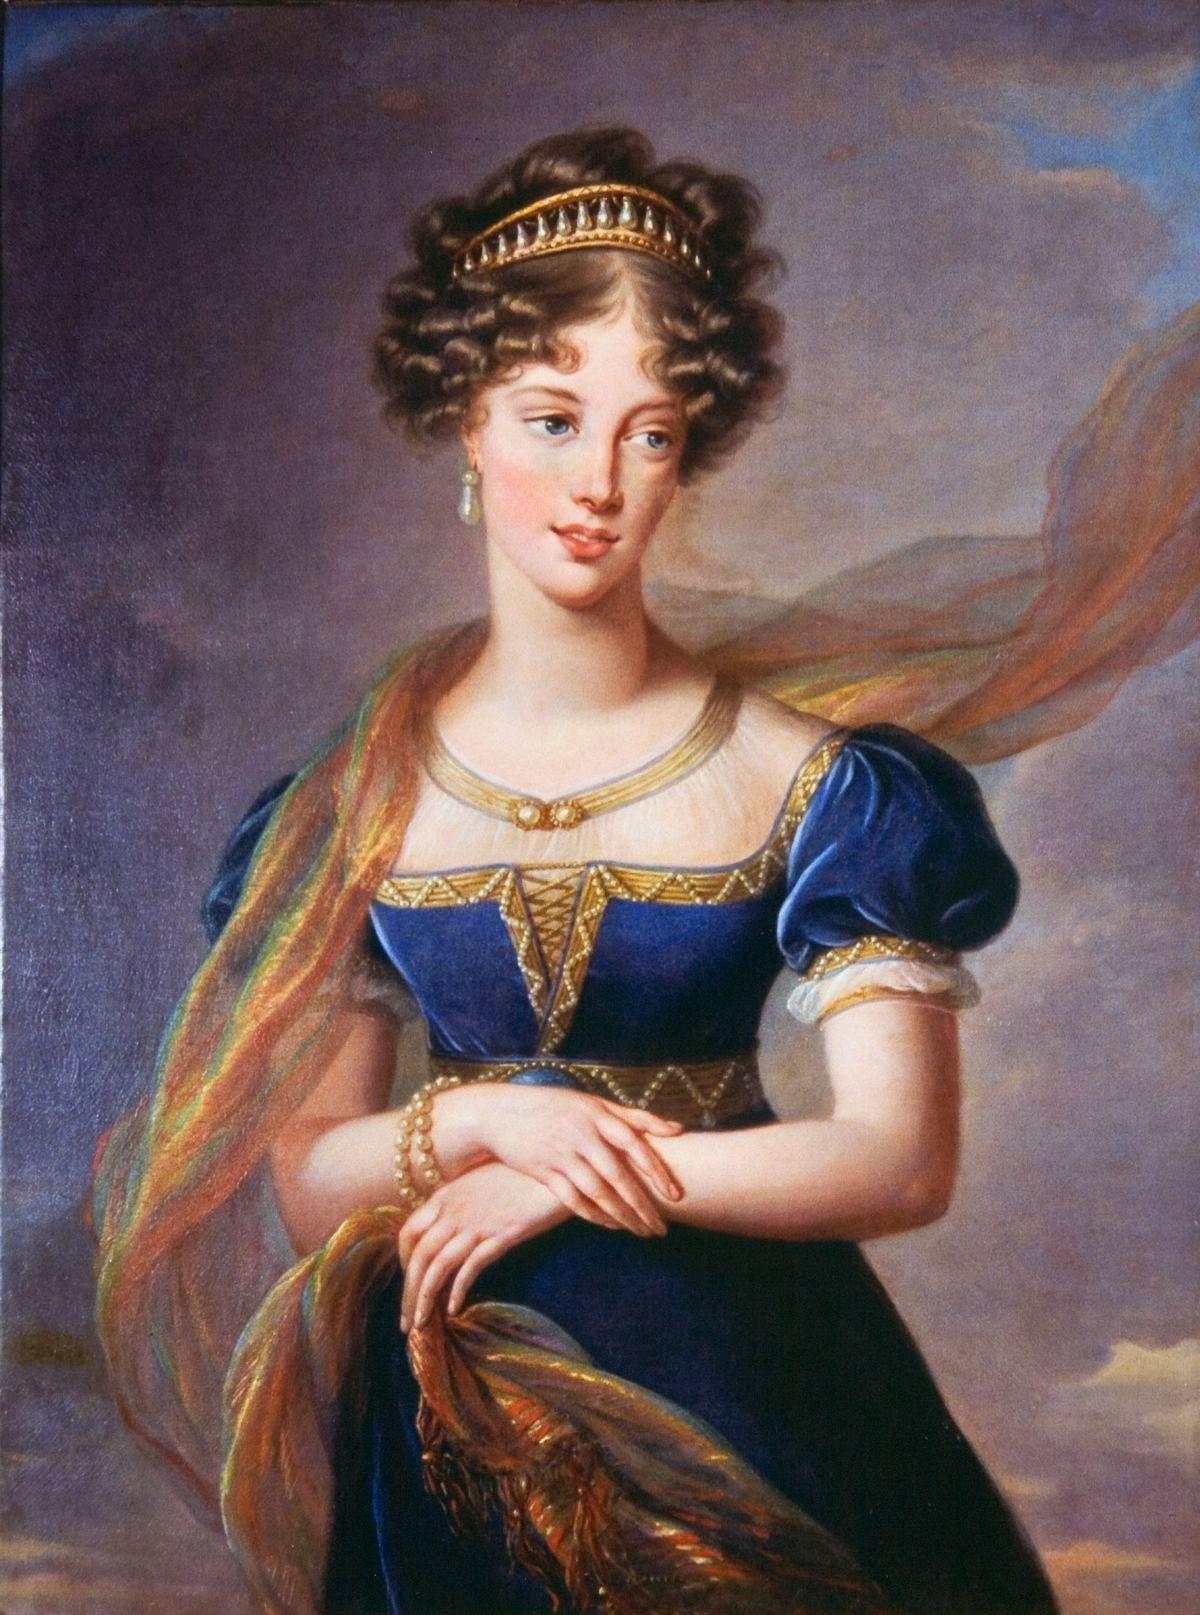 Fichier:Louise-Elisabeth Vigée-Lebrun - La duchesse de Berry en robe de velours bleu.jpg